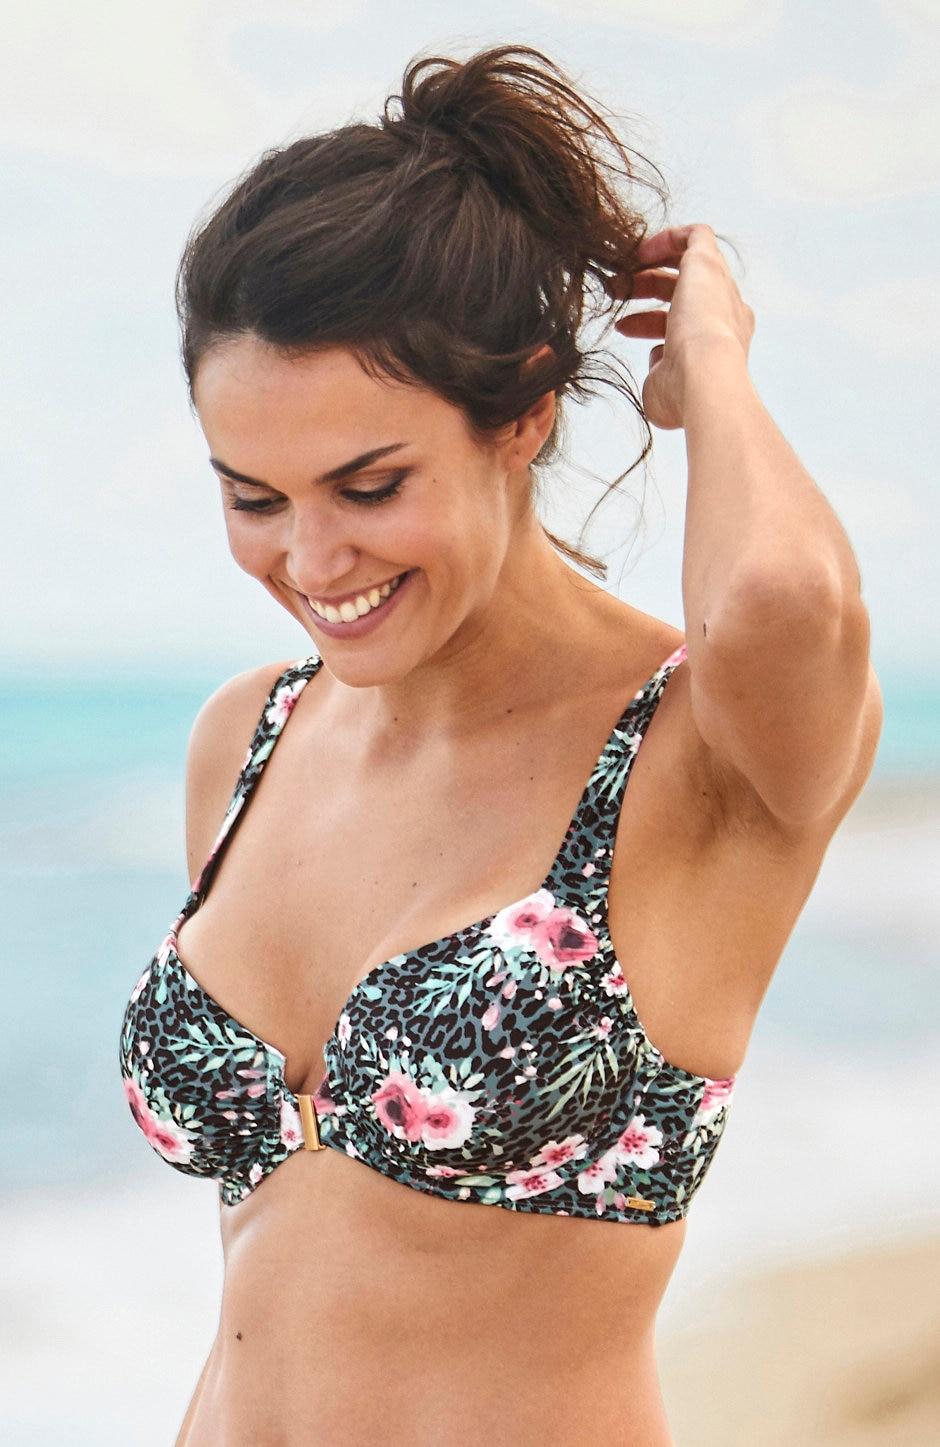 Bikini-bh med bøyle som lukkes foran